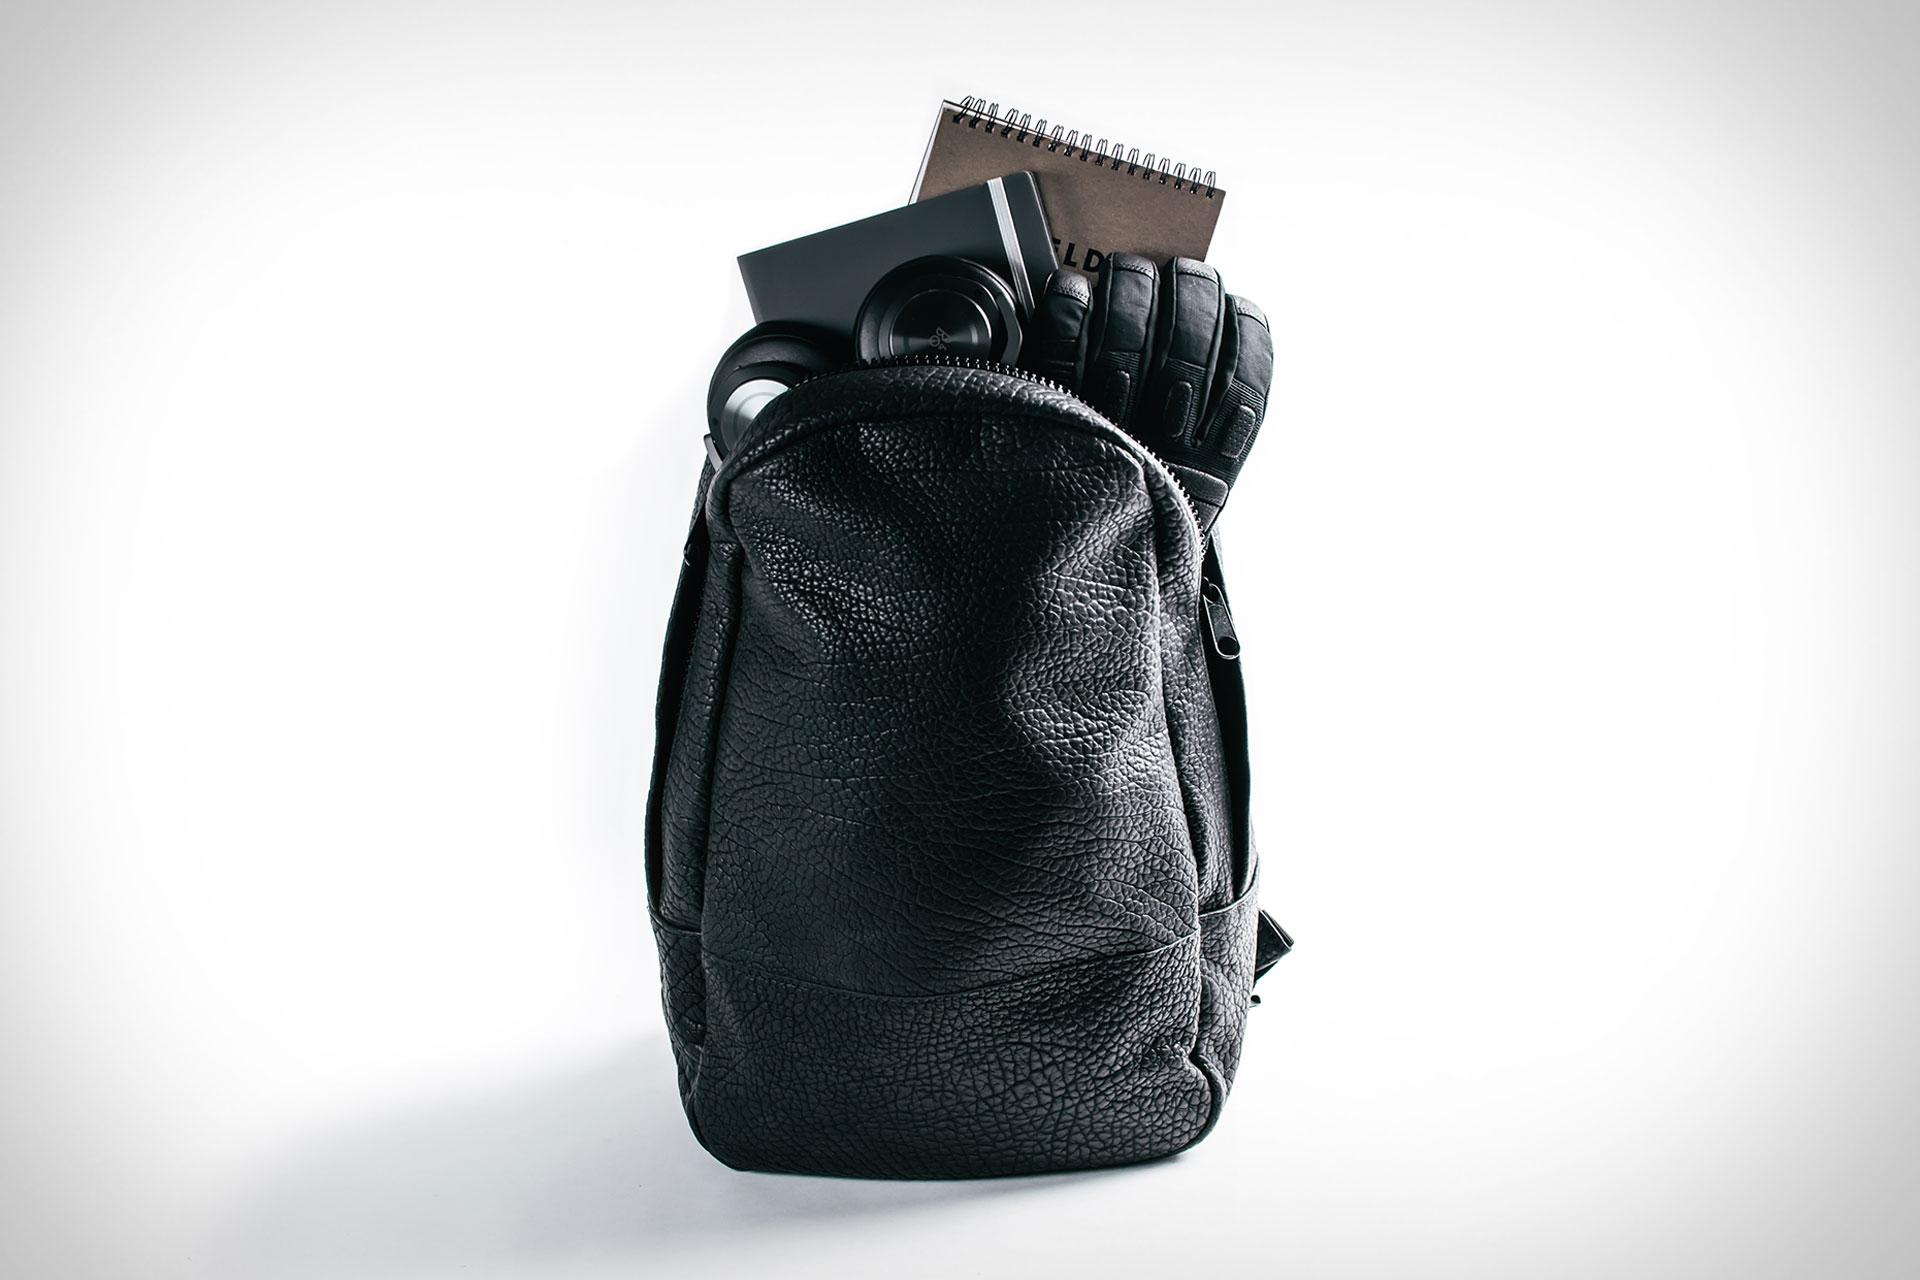 Jack + Mulligan x Uncrate Welles Backpack